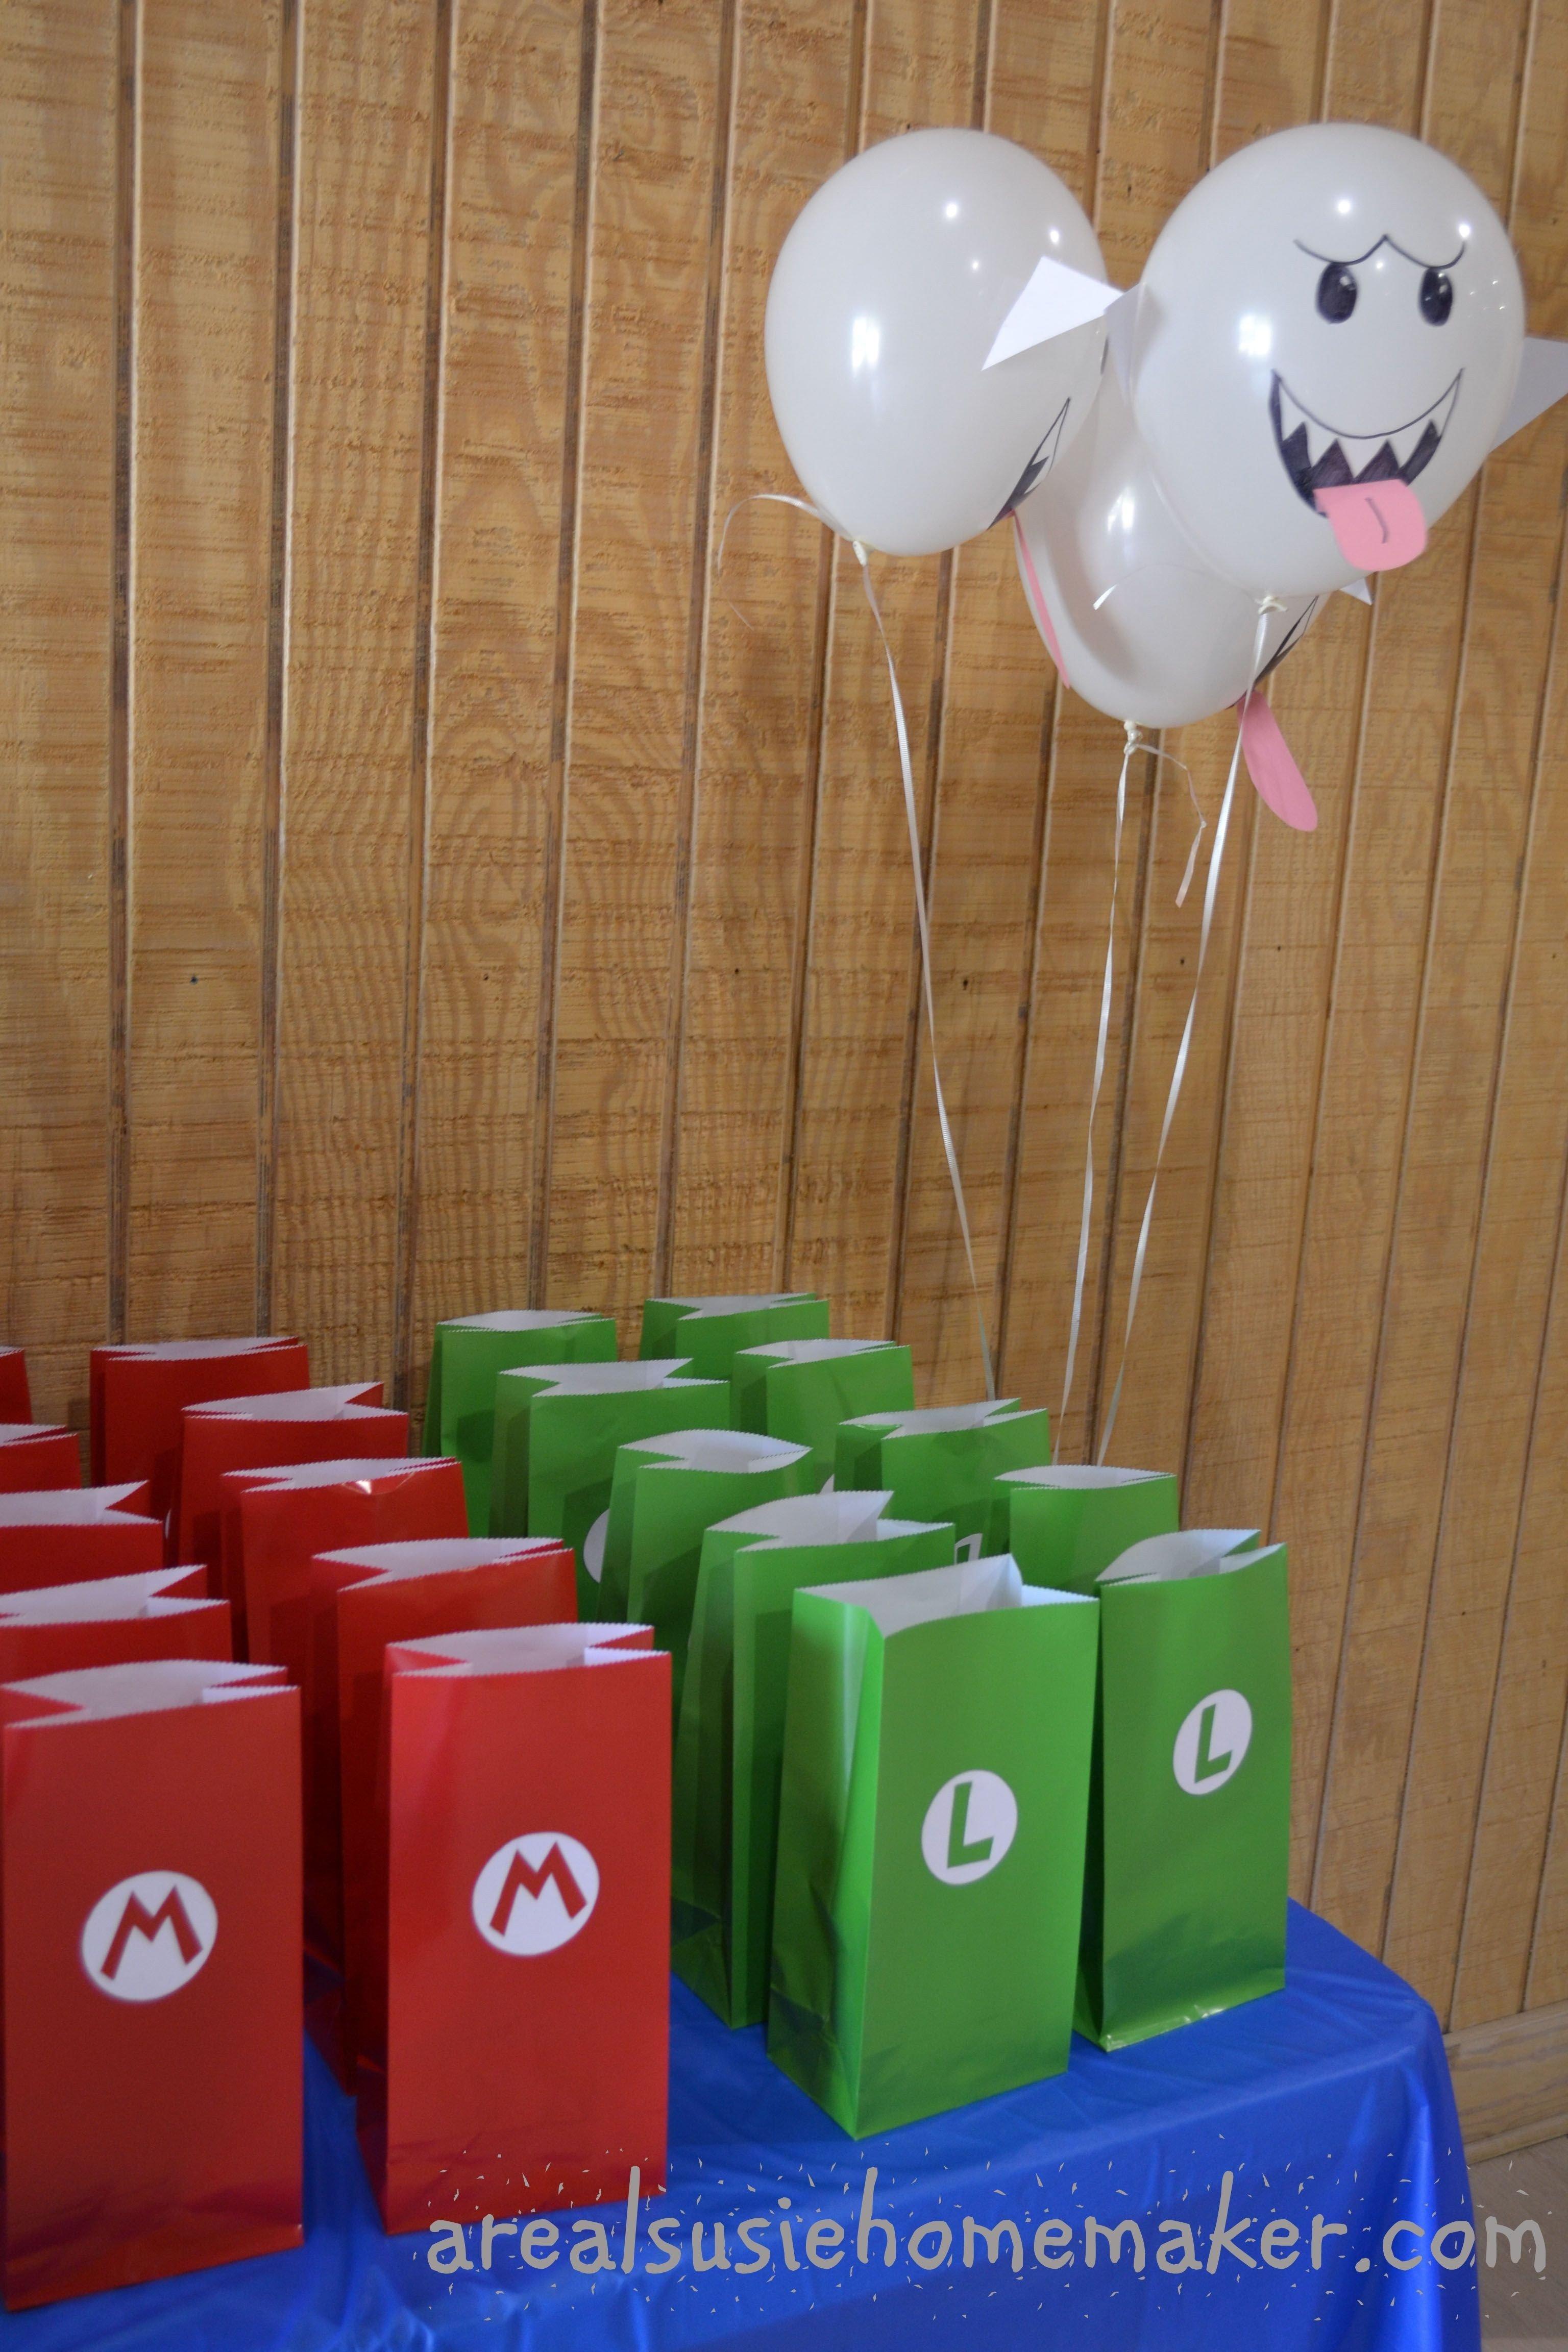 10 Stylish Super Mario Bros Birthday Party Ideas super mario bros birthday party ideas scheme of video game party 2020